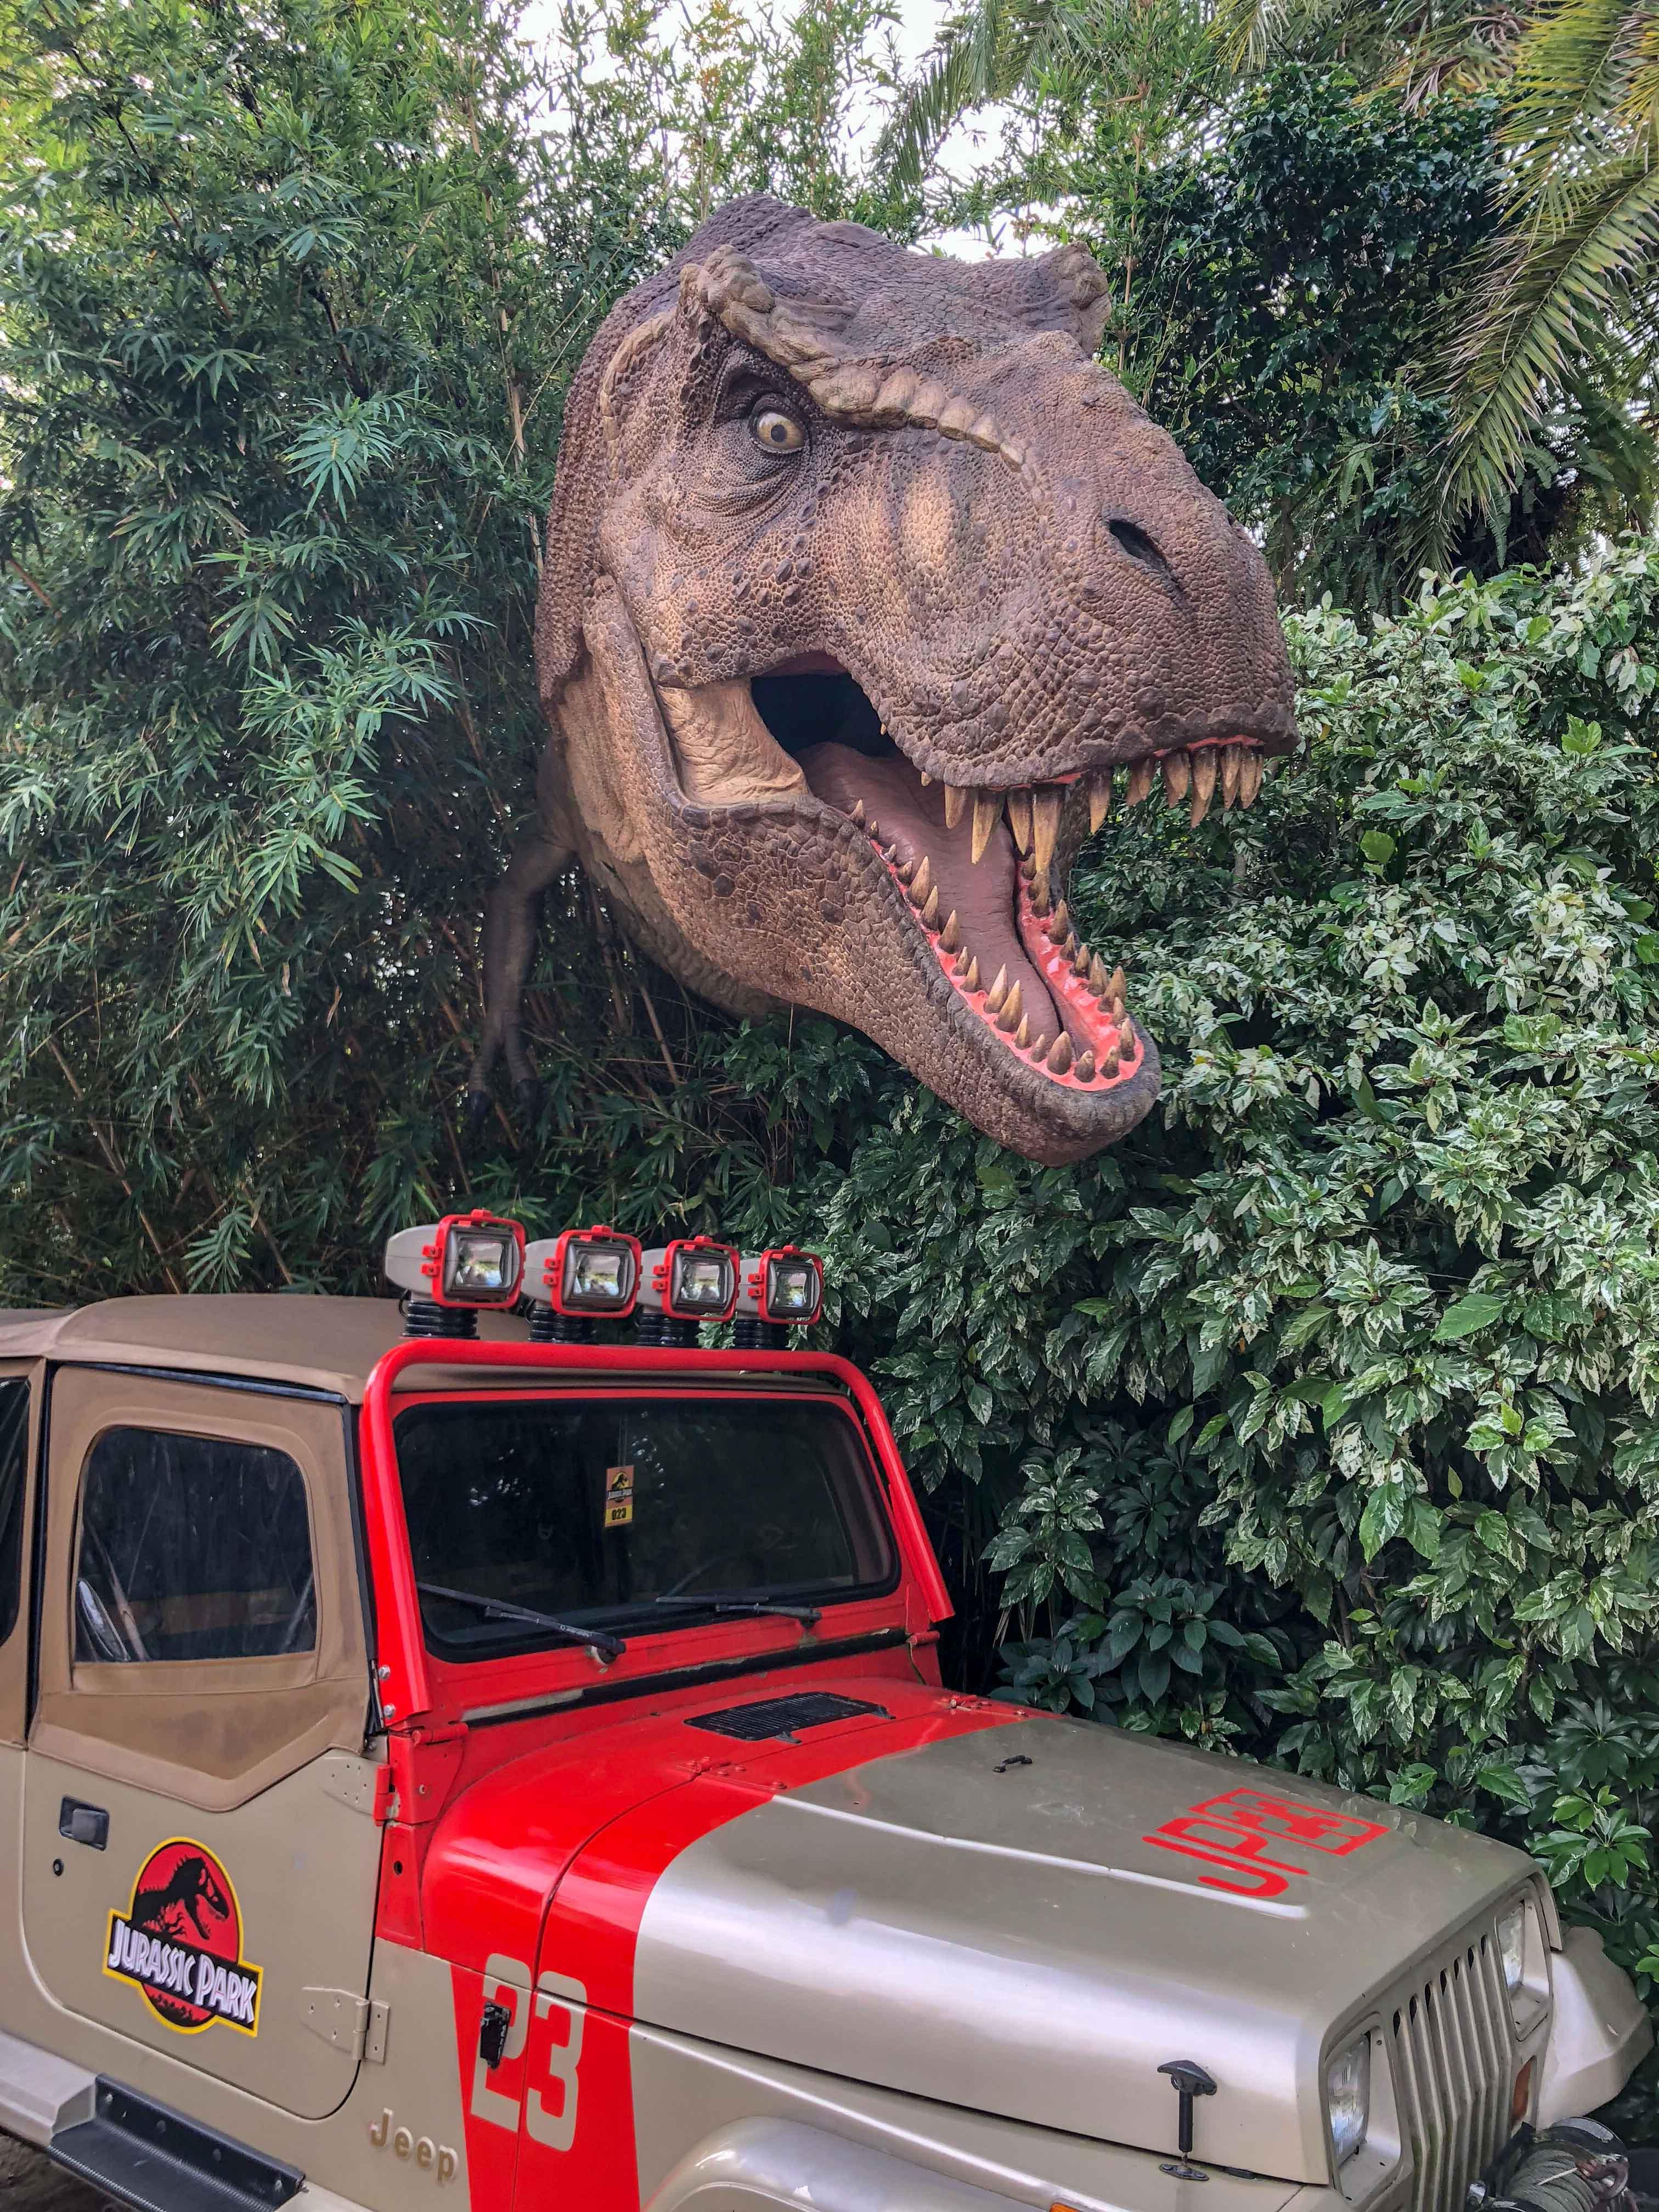 Jurrasic Park Universal Islands Adventure Orlando Odysight